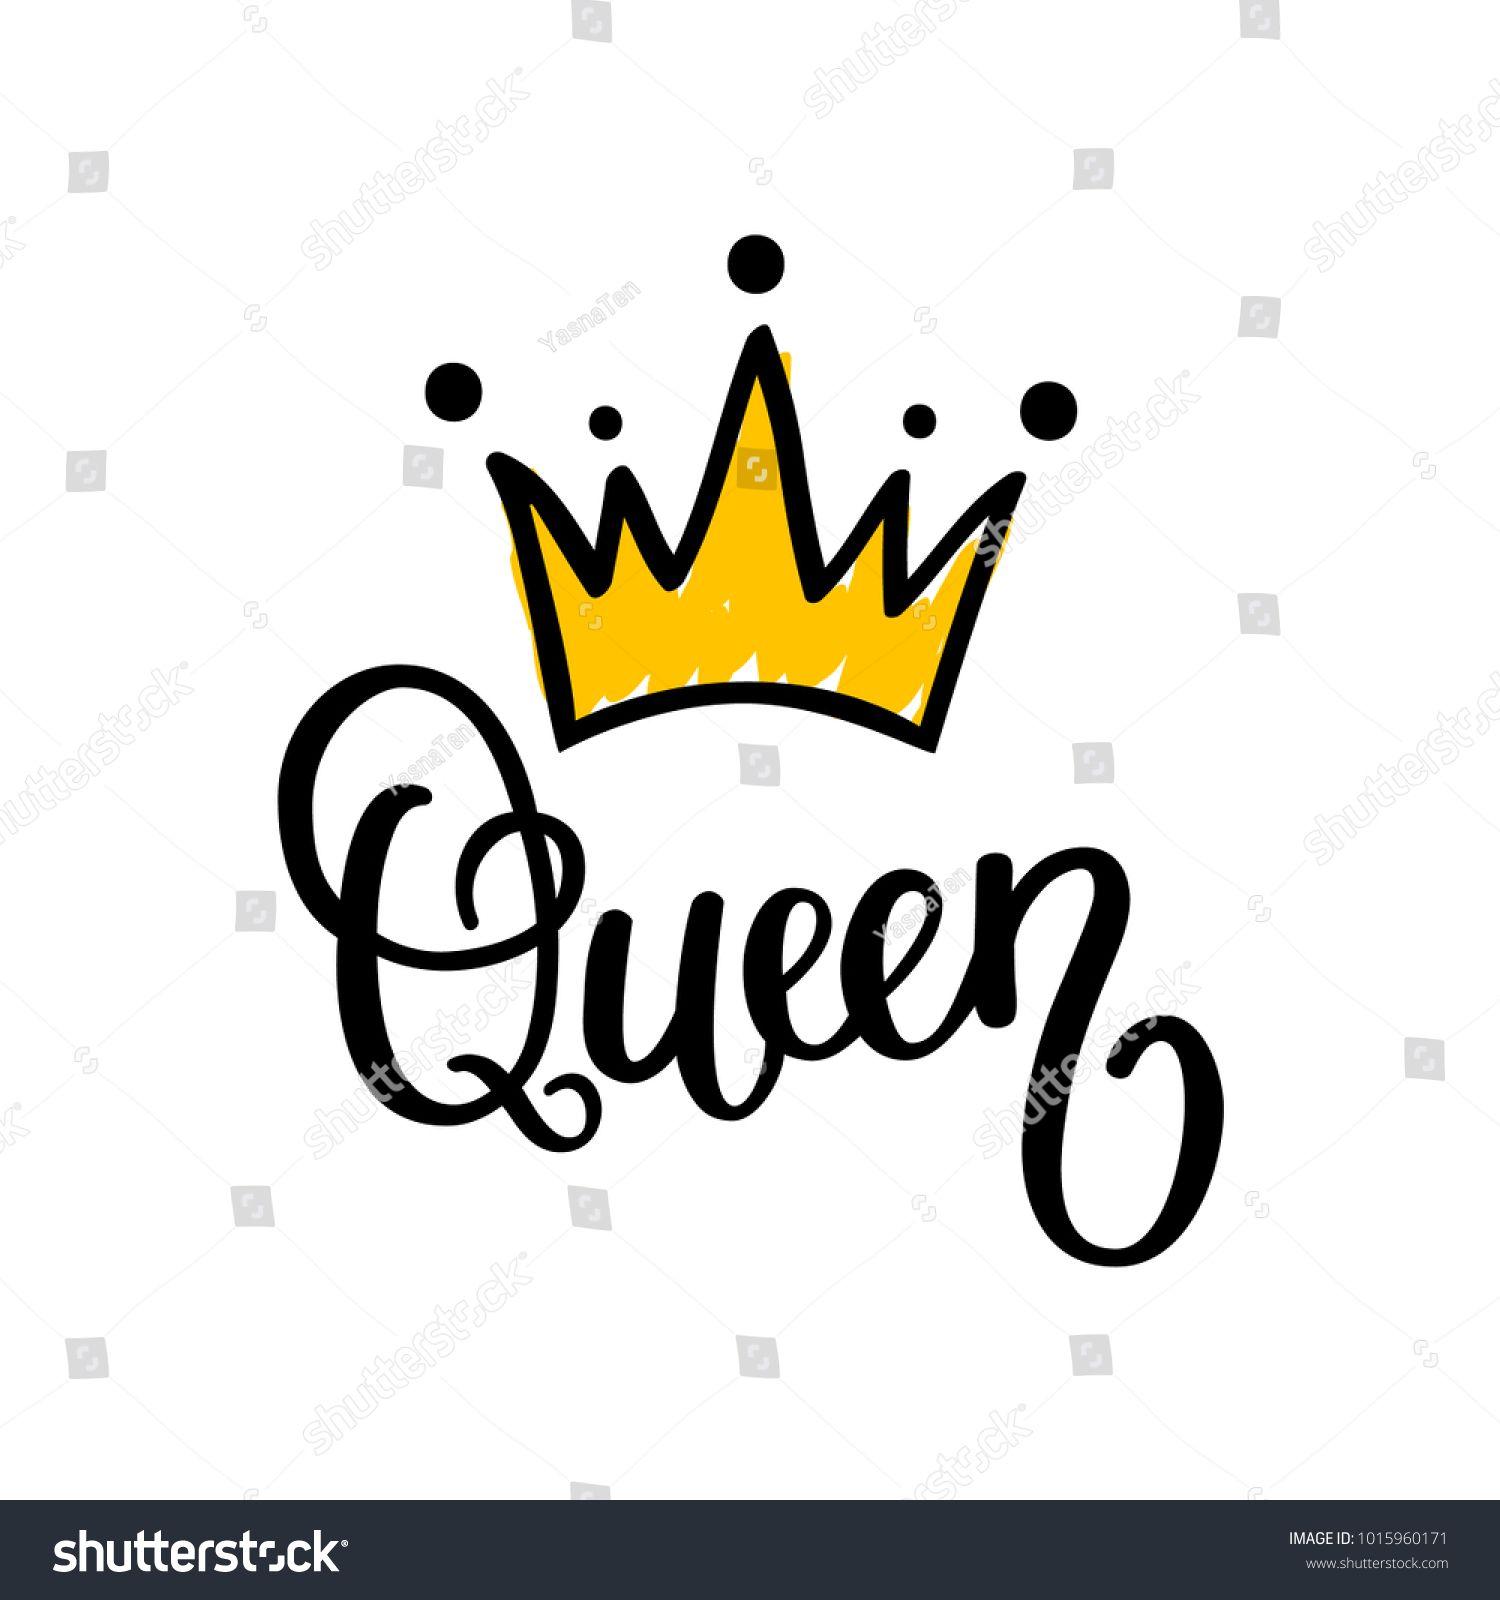 Queen Crown Vector Calligraphy Design Funny Poster Queen Wallpaper Crown Queens Wallpaper Queen Images